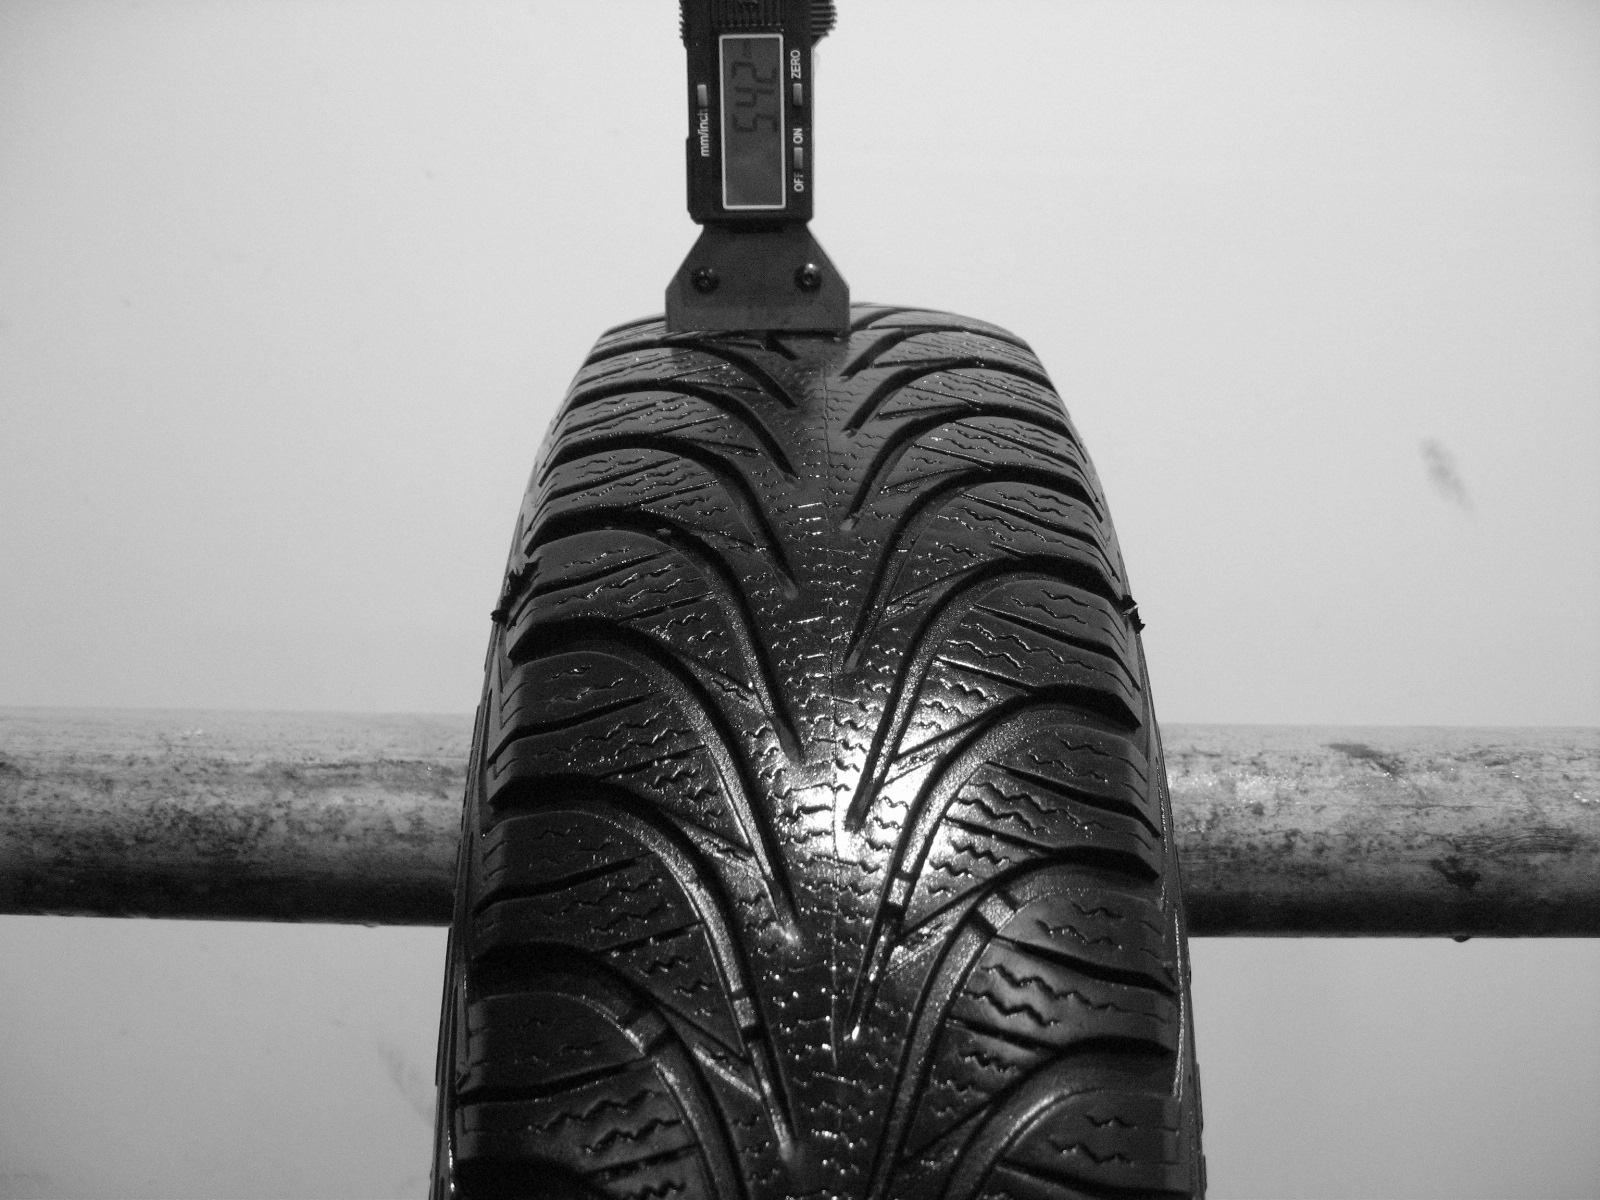 Použité-Pneu-Bazar - 145/80 R13 GOODYEAR ULTRAGRIP 6 -kusovka-rezerva 3mm